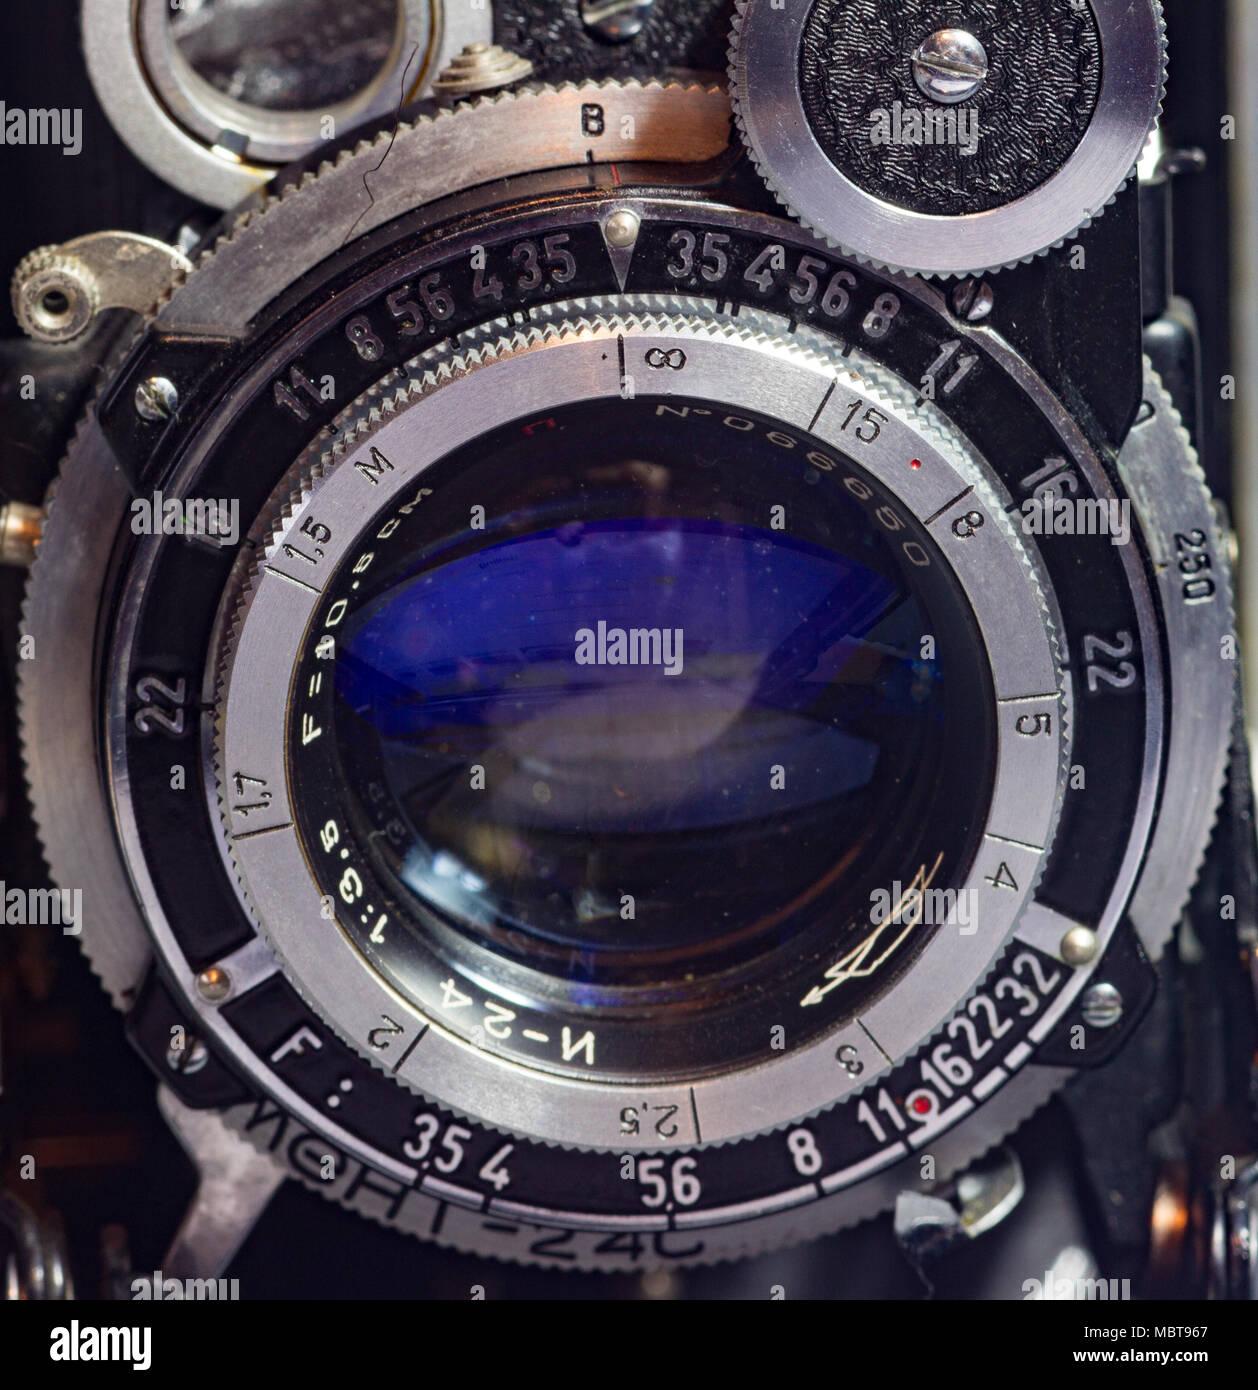 Closseup of vintage folding bellows film camera. UK - Stock Image